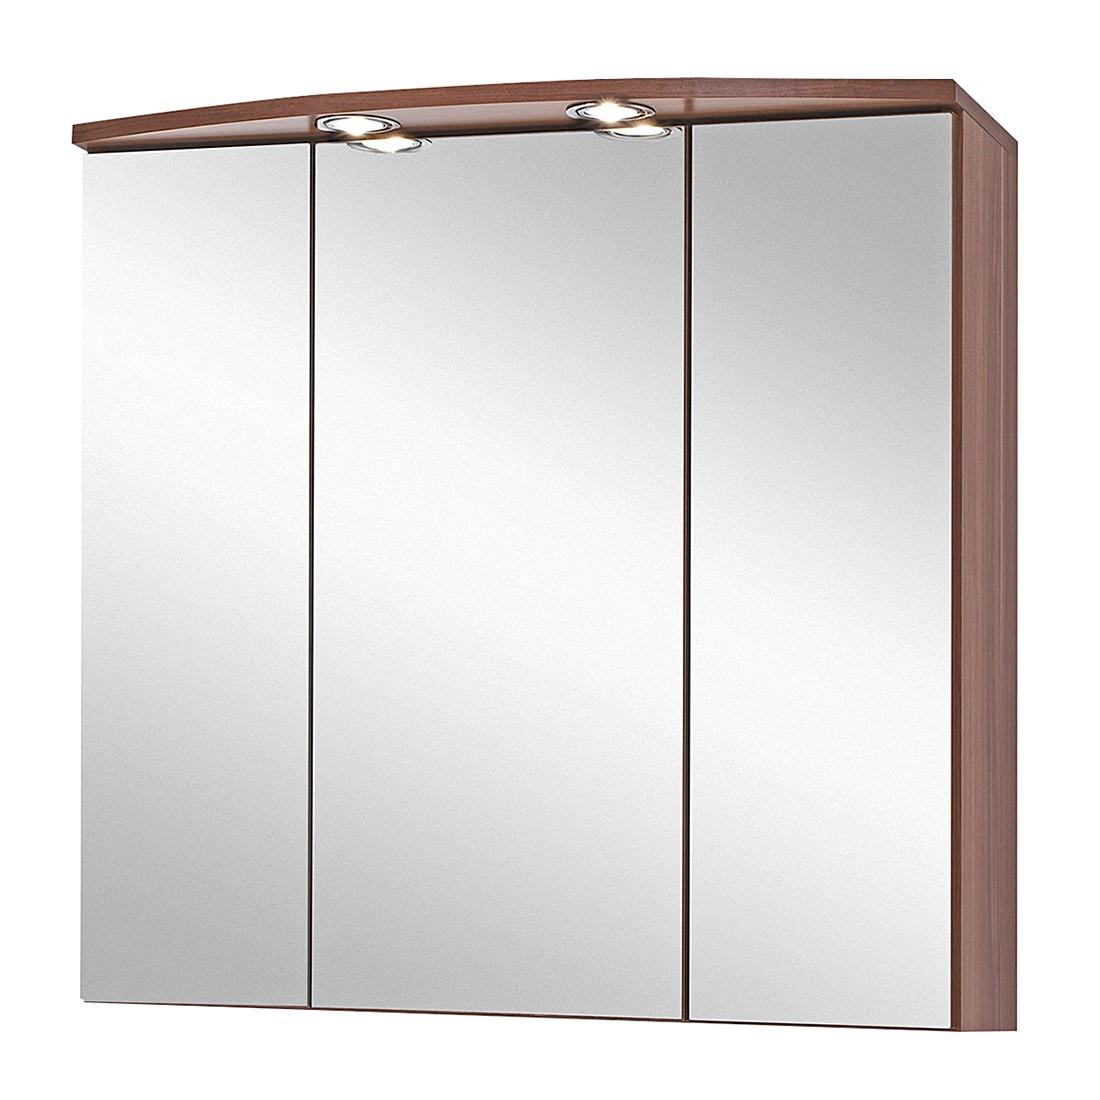 EEK A+, Armoire à miroir 3D Marino - Imitation noyer, Giessbach